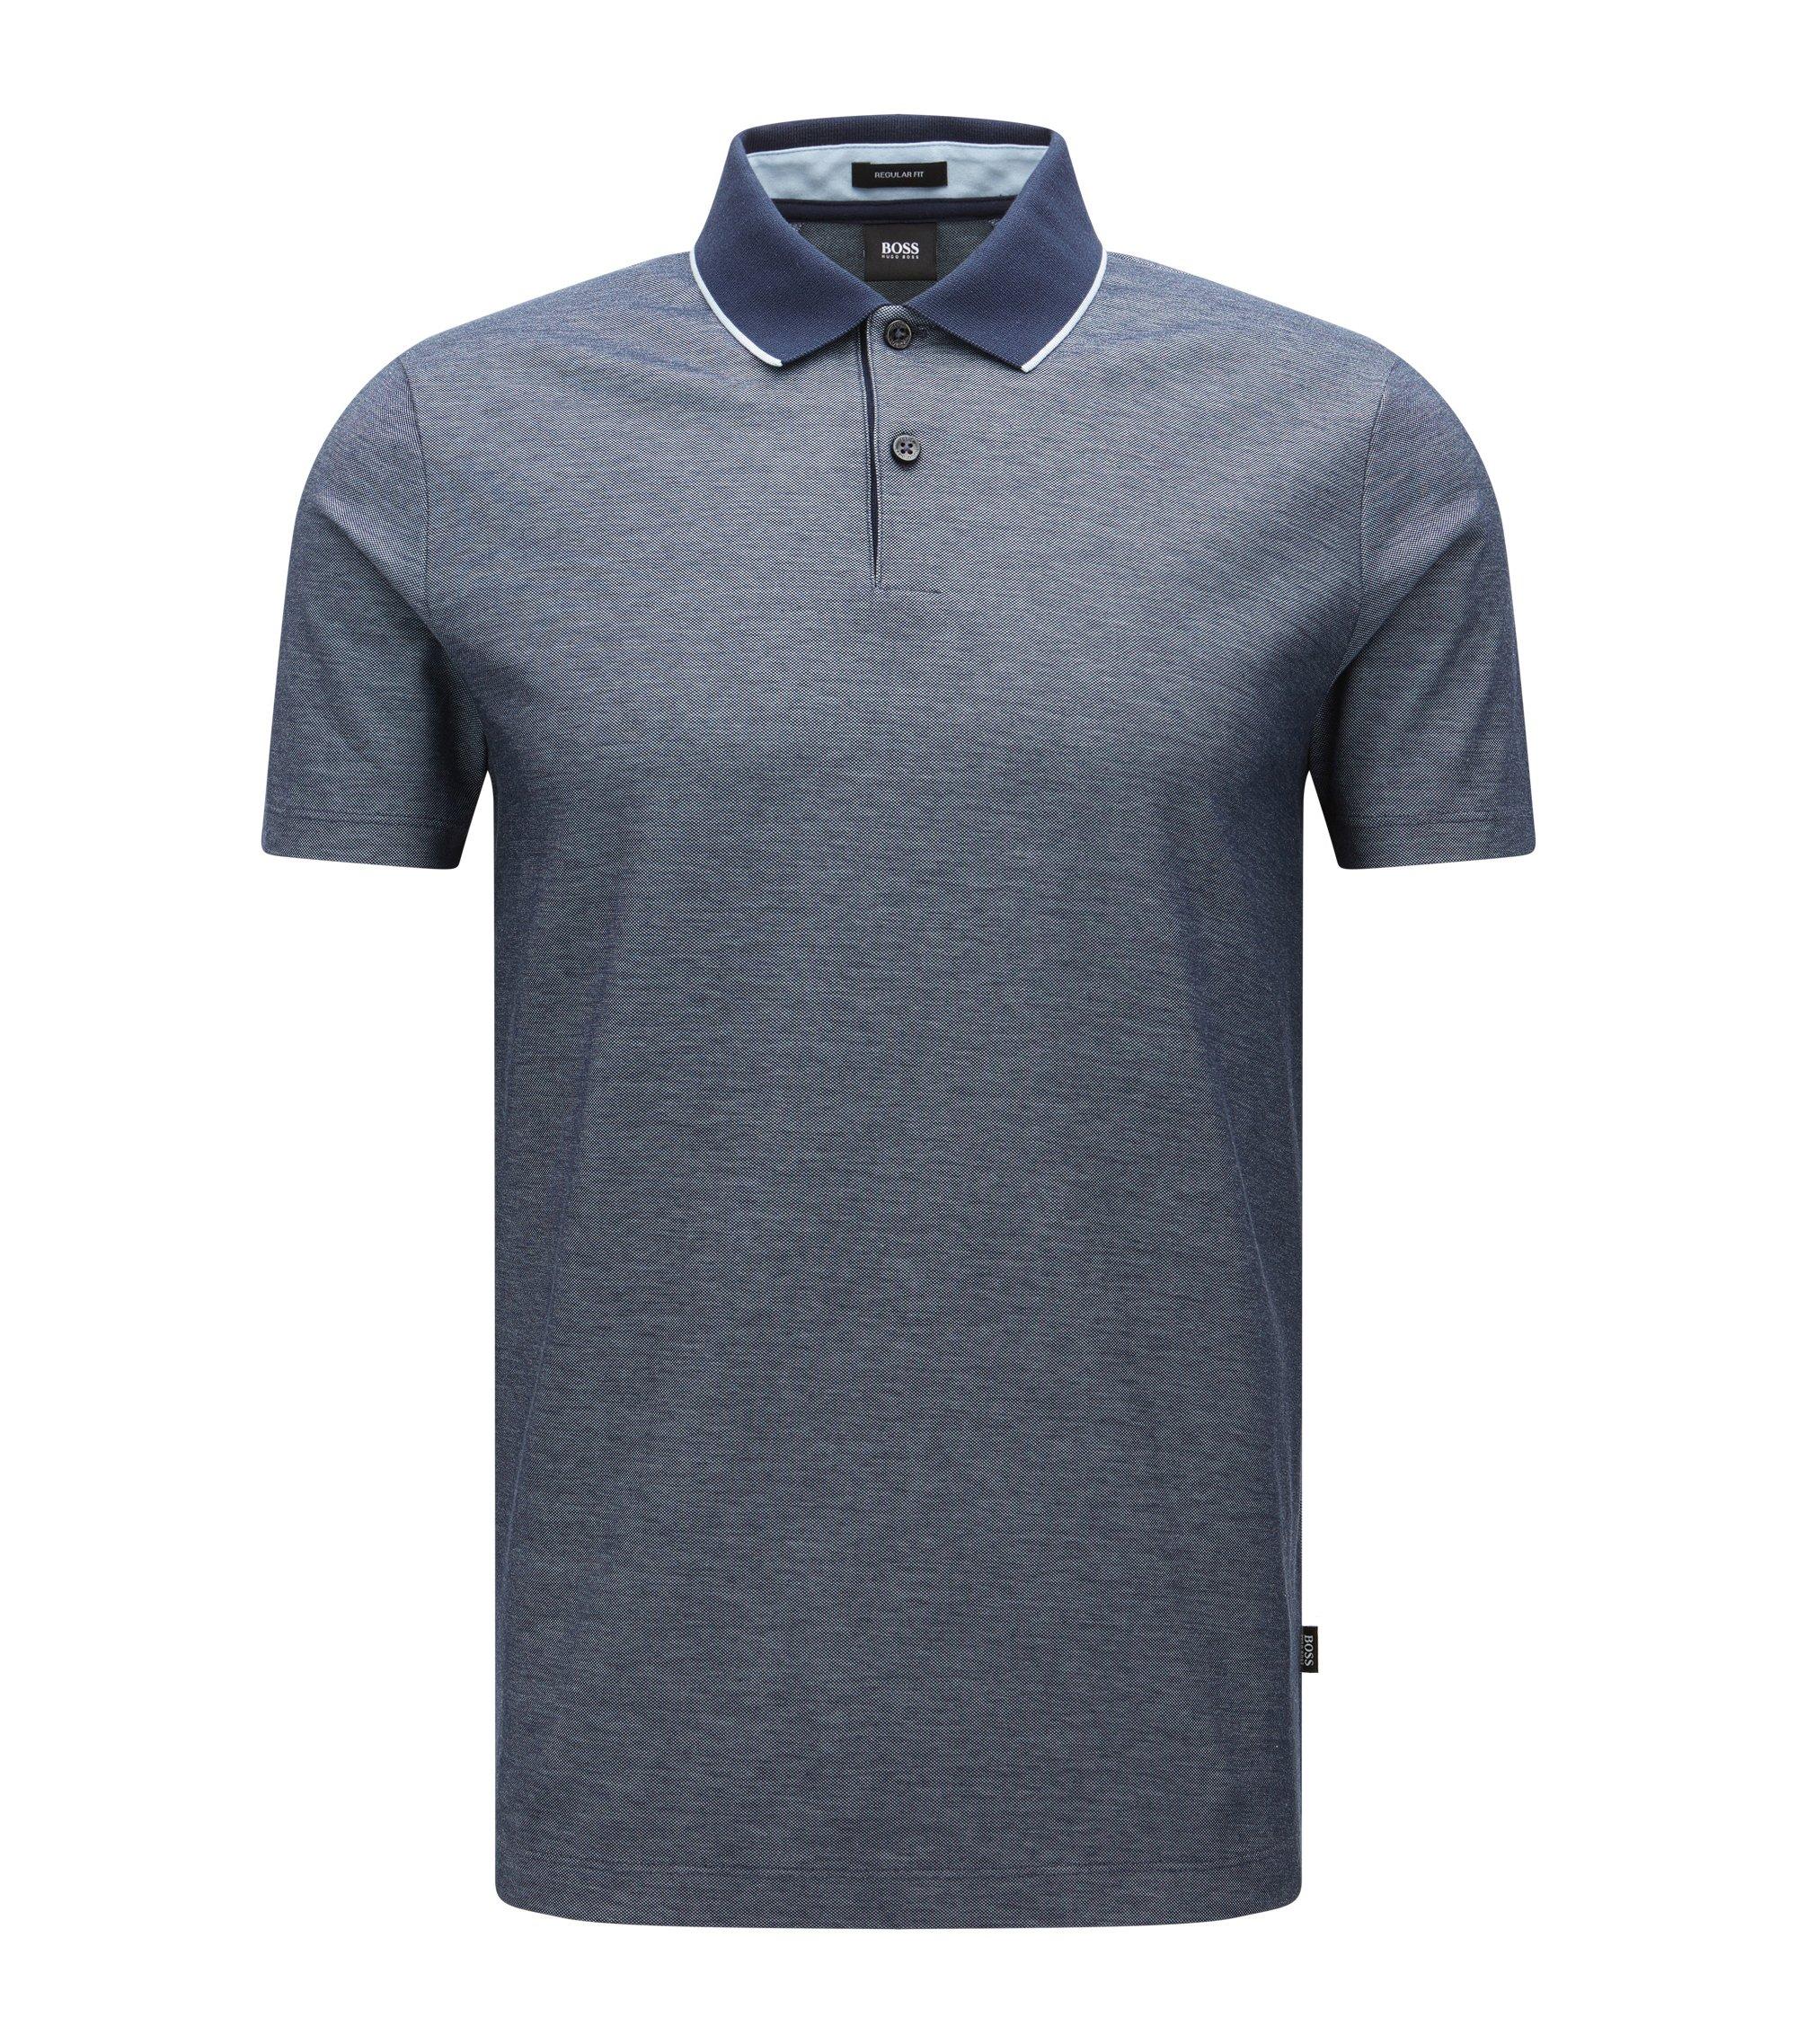 Regular-Fit Poloshirt aus melierter Baumwolle, Dunkelblau